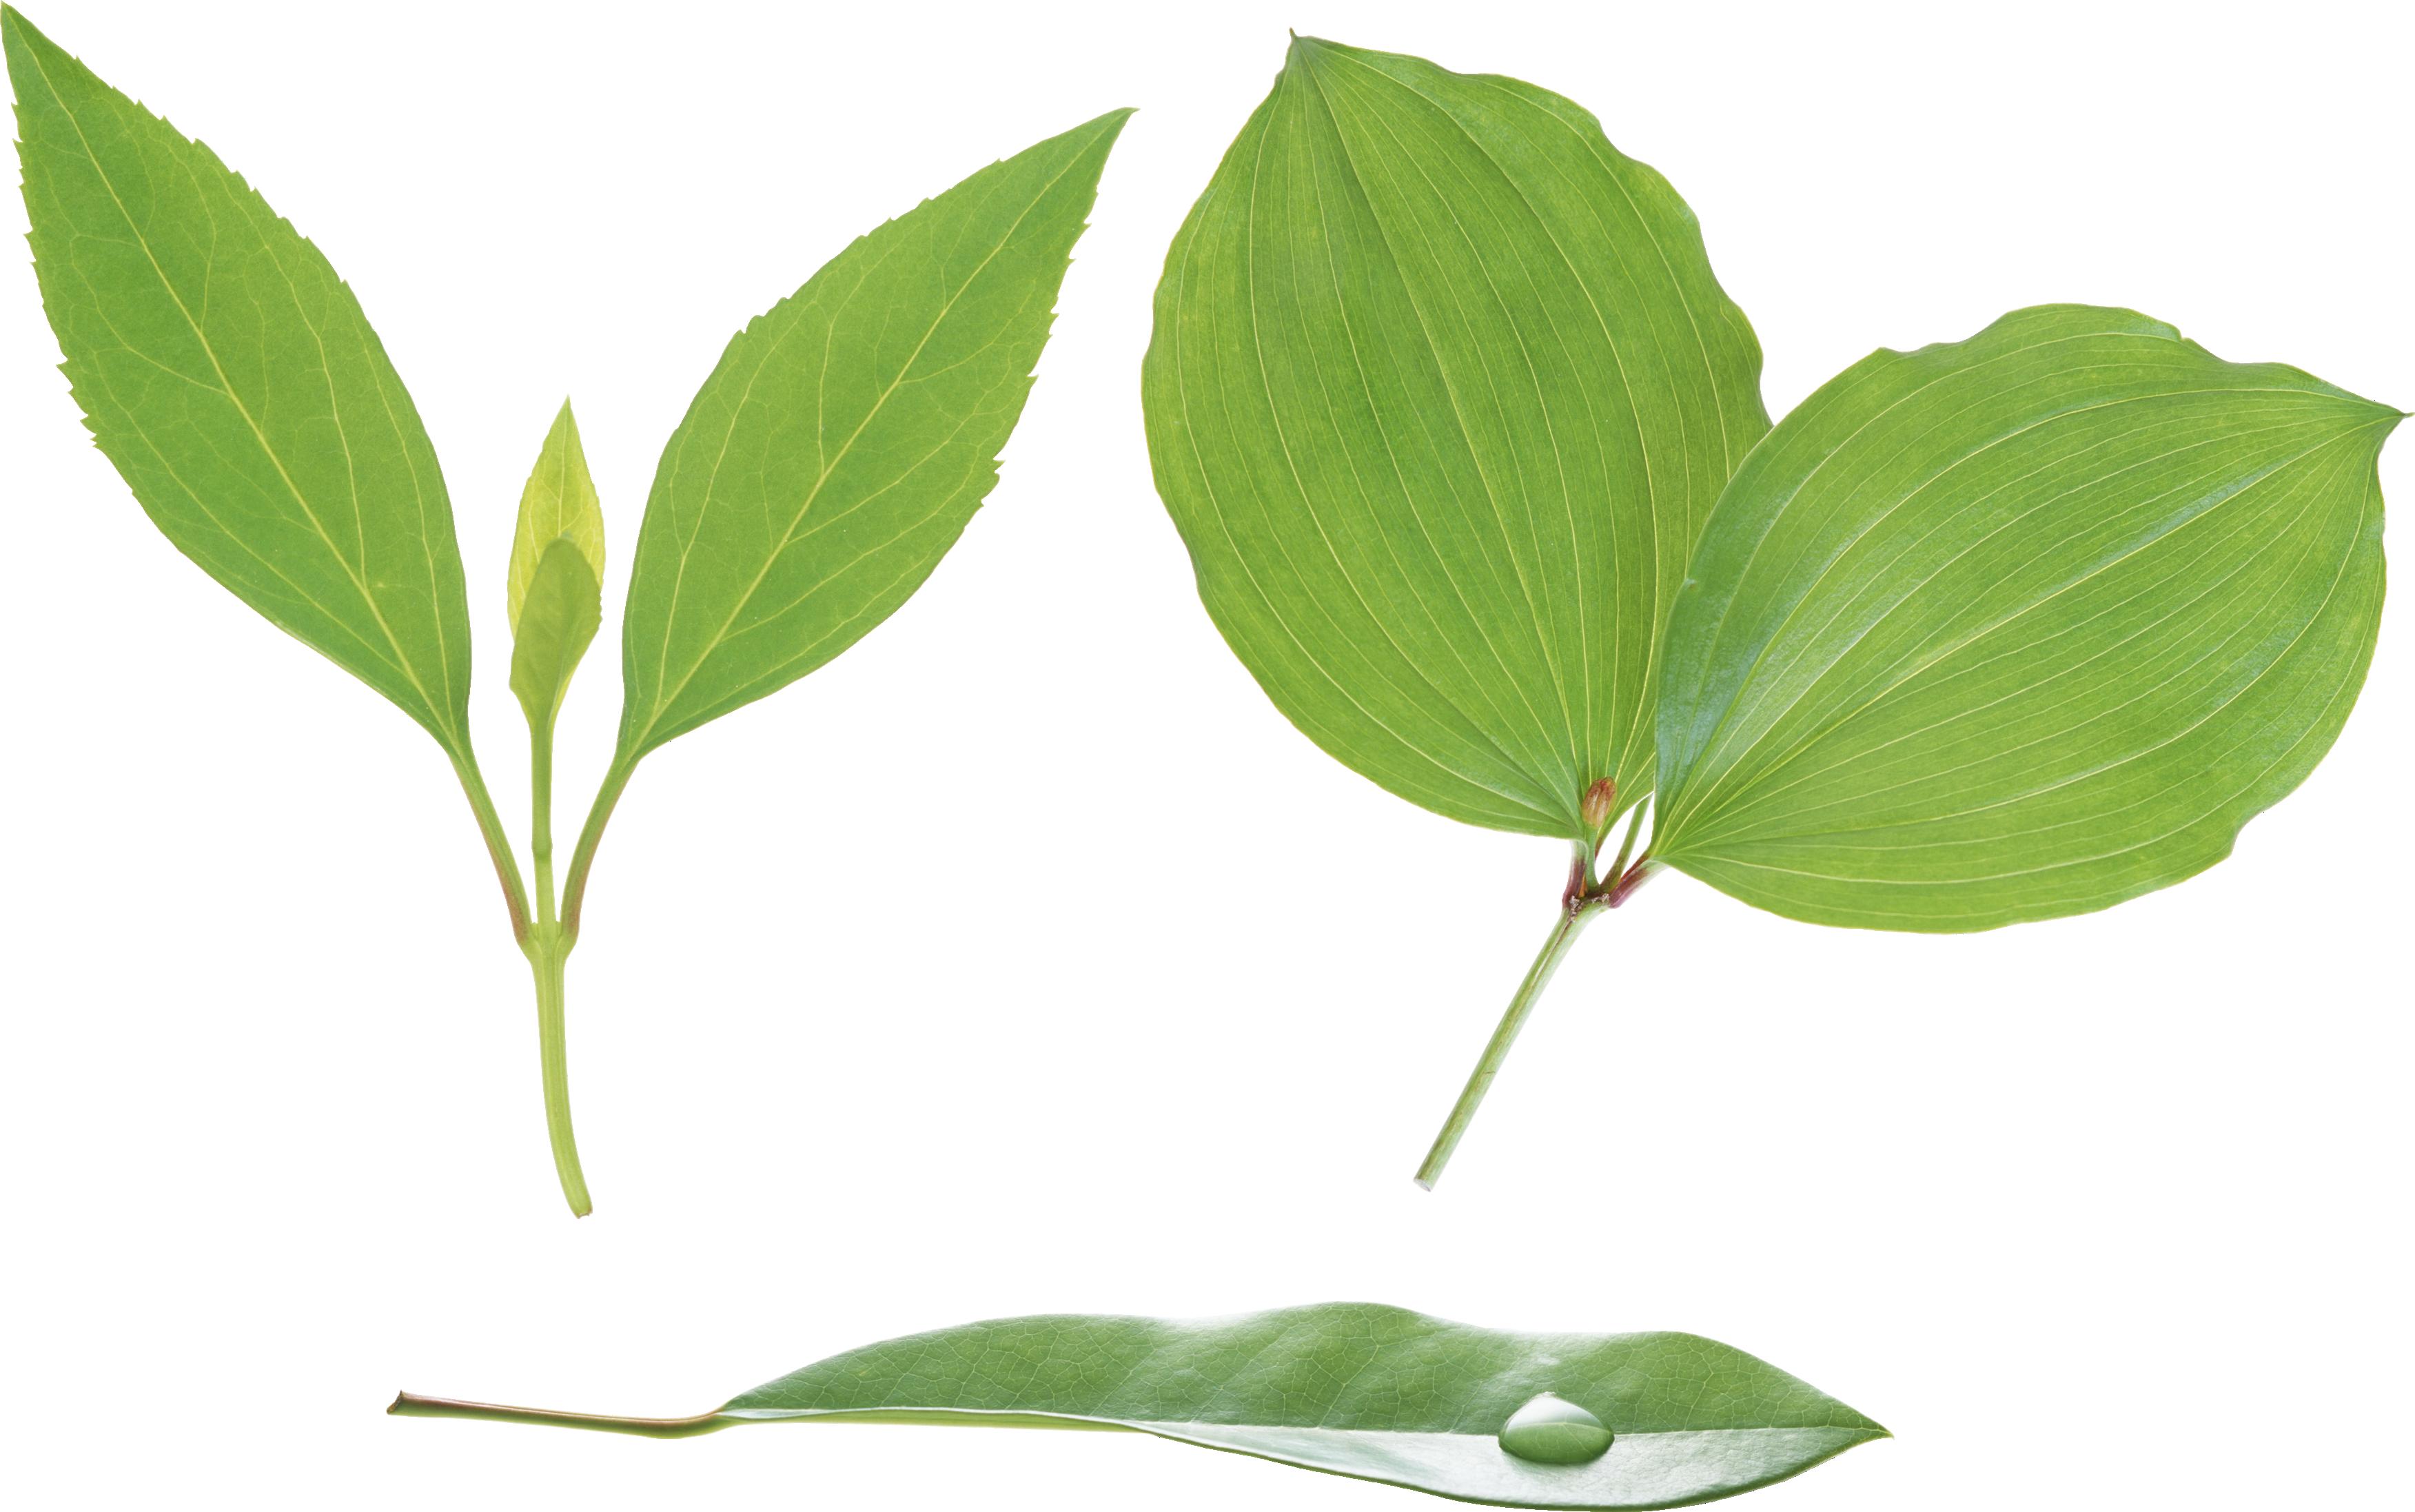 Green Leaf Png Hd image #44868